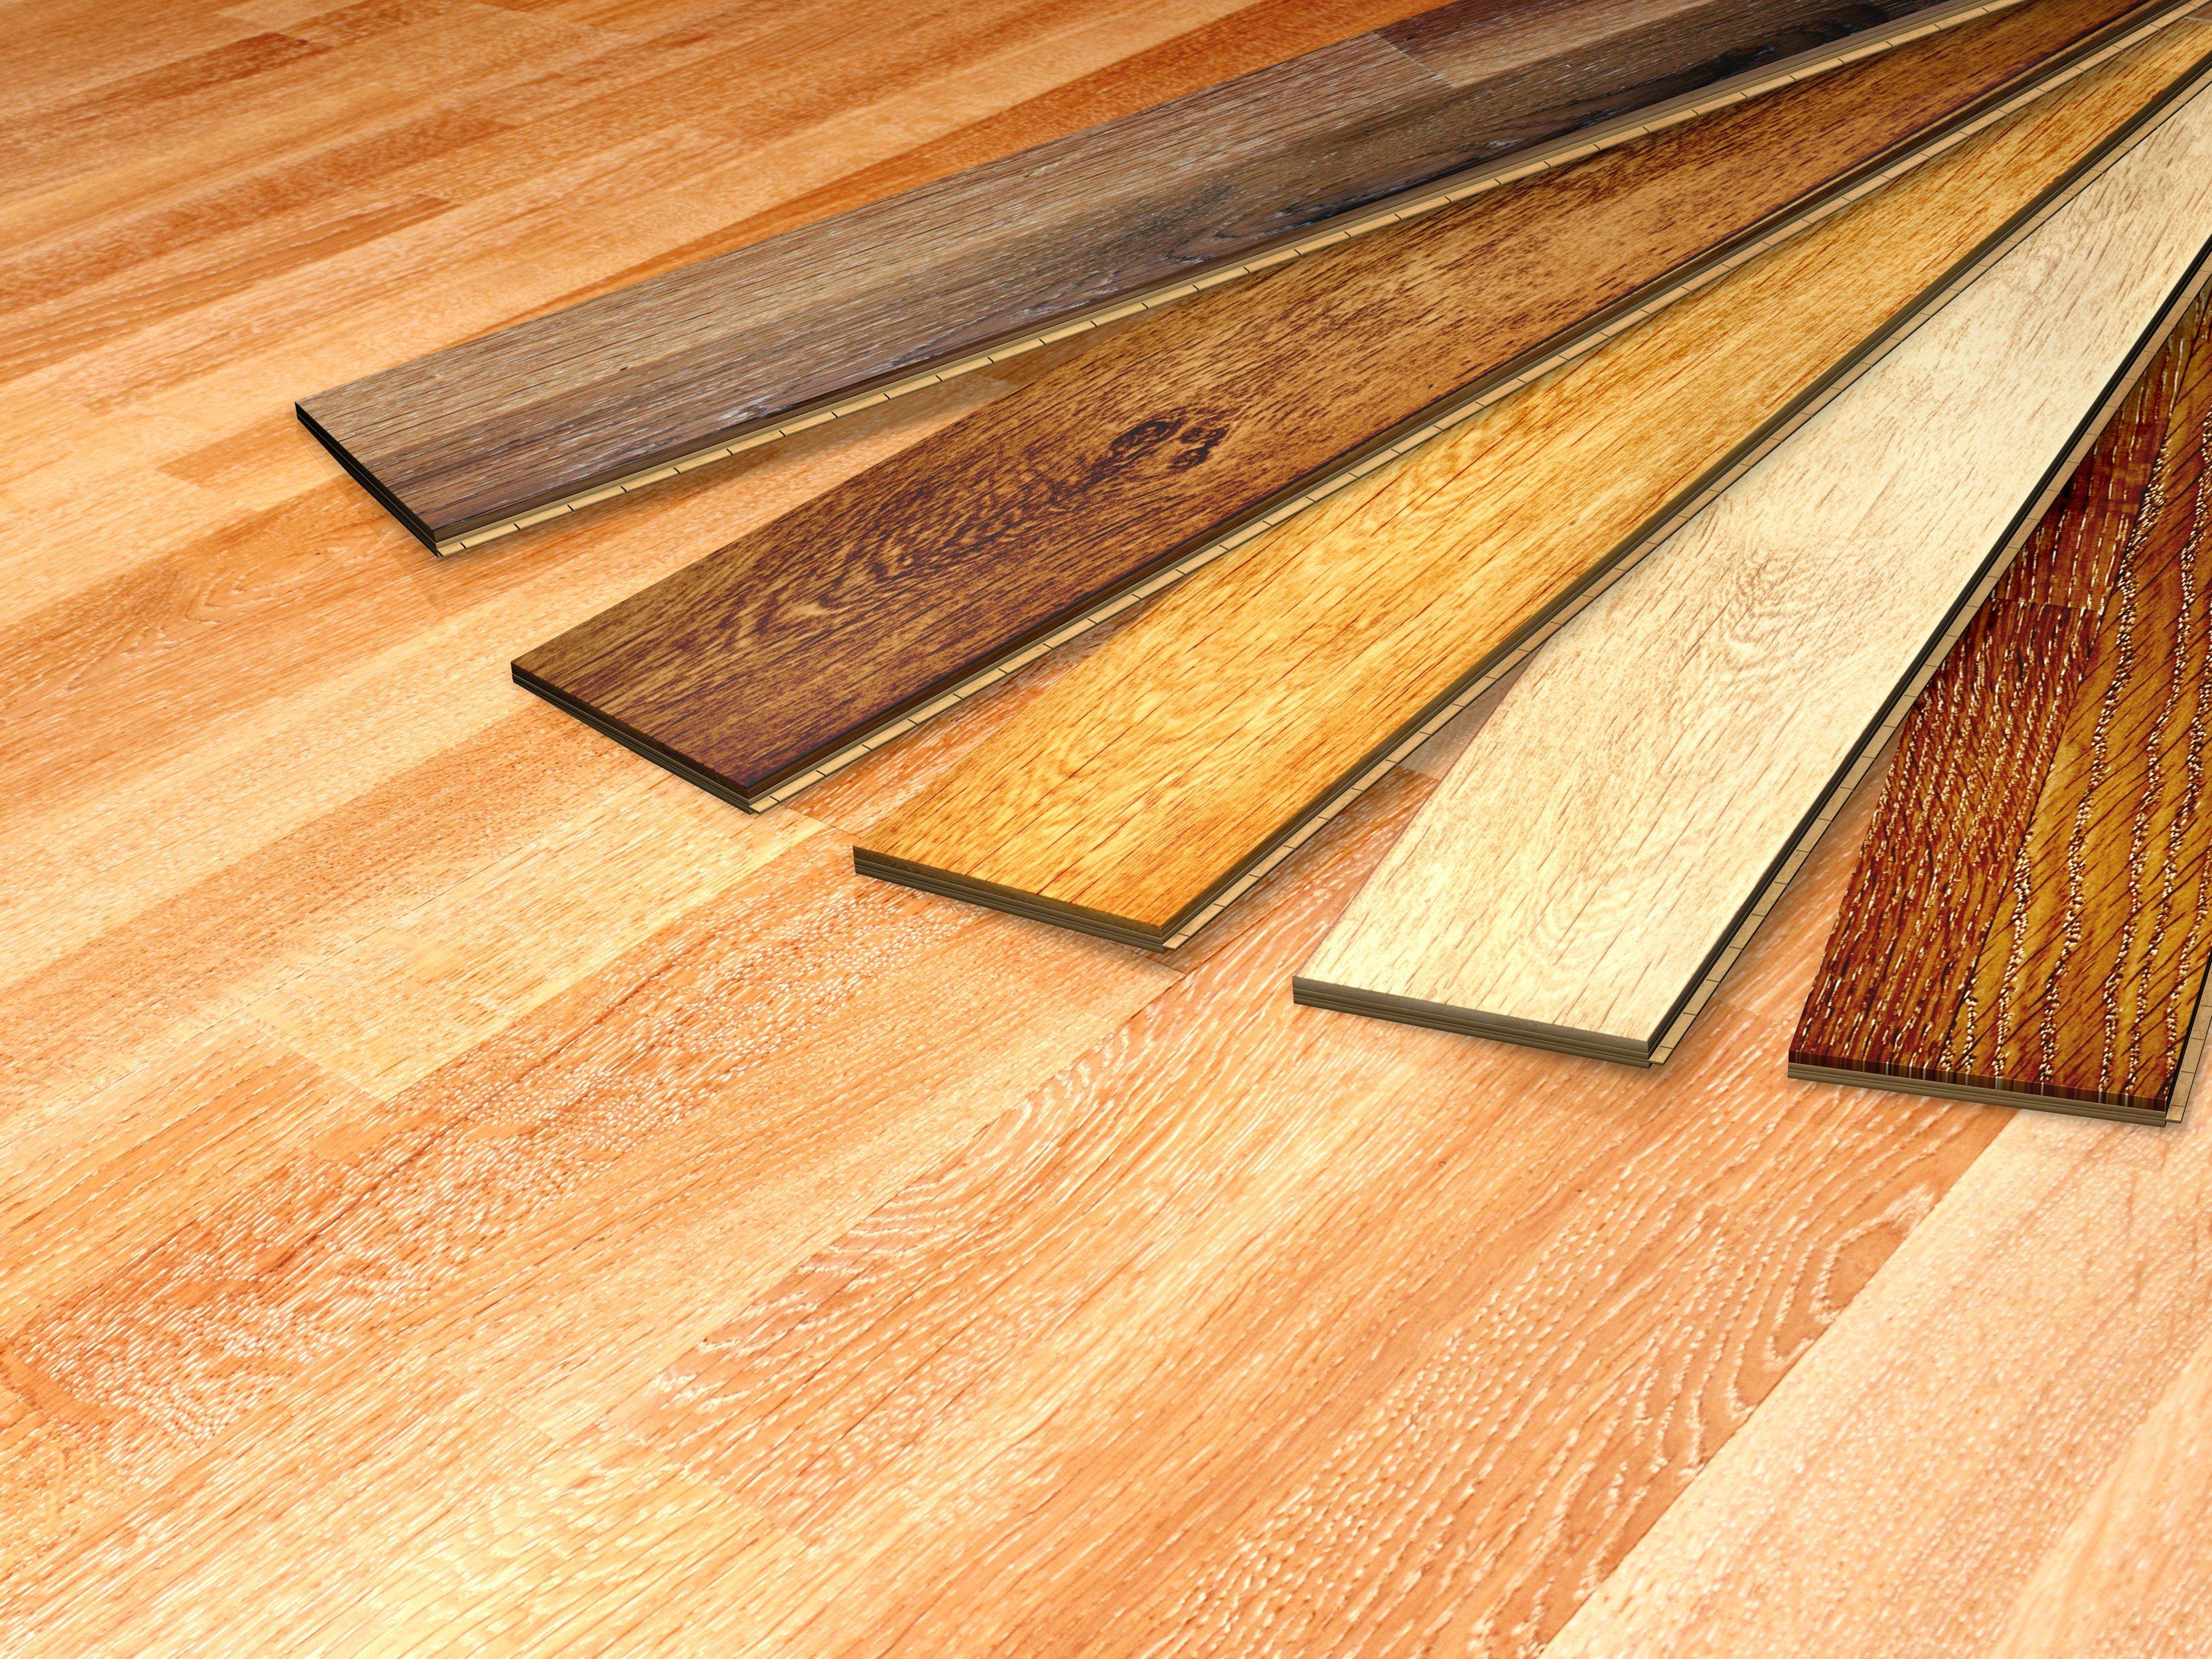 Flooring hardwood laminate tile marble for sale Rogers Arkansas